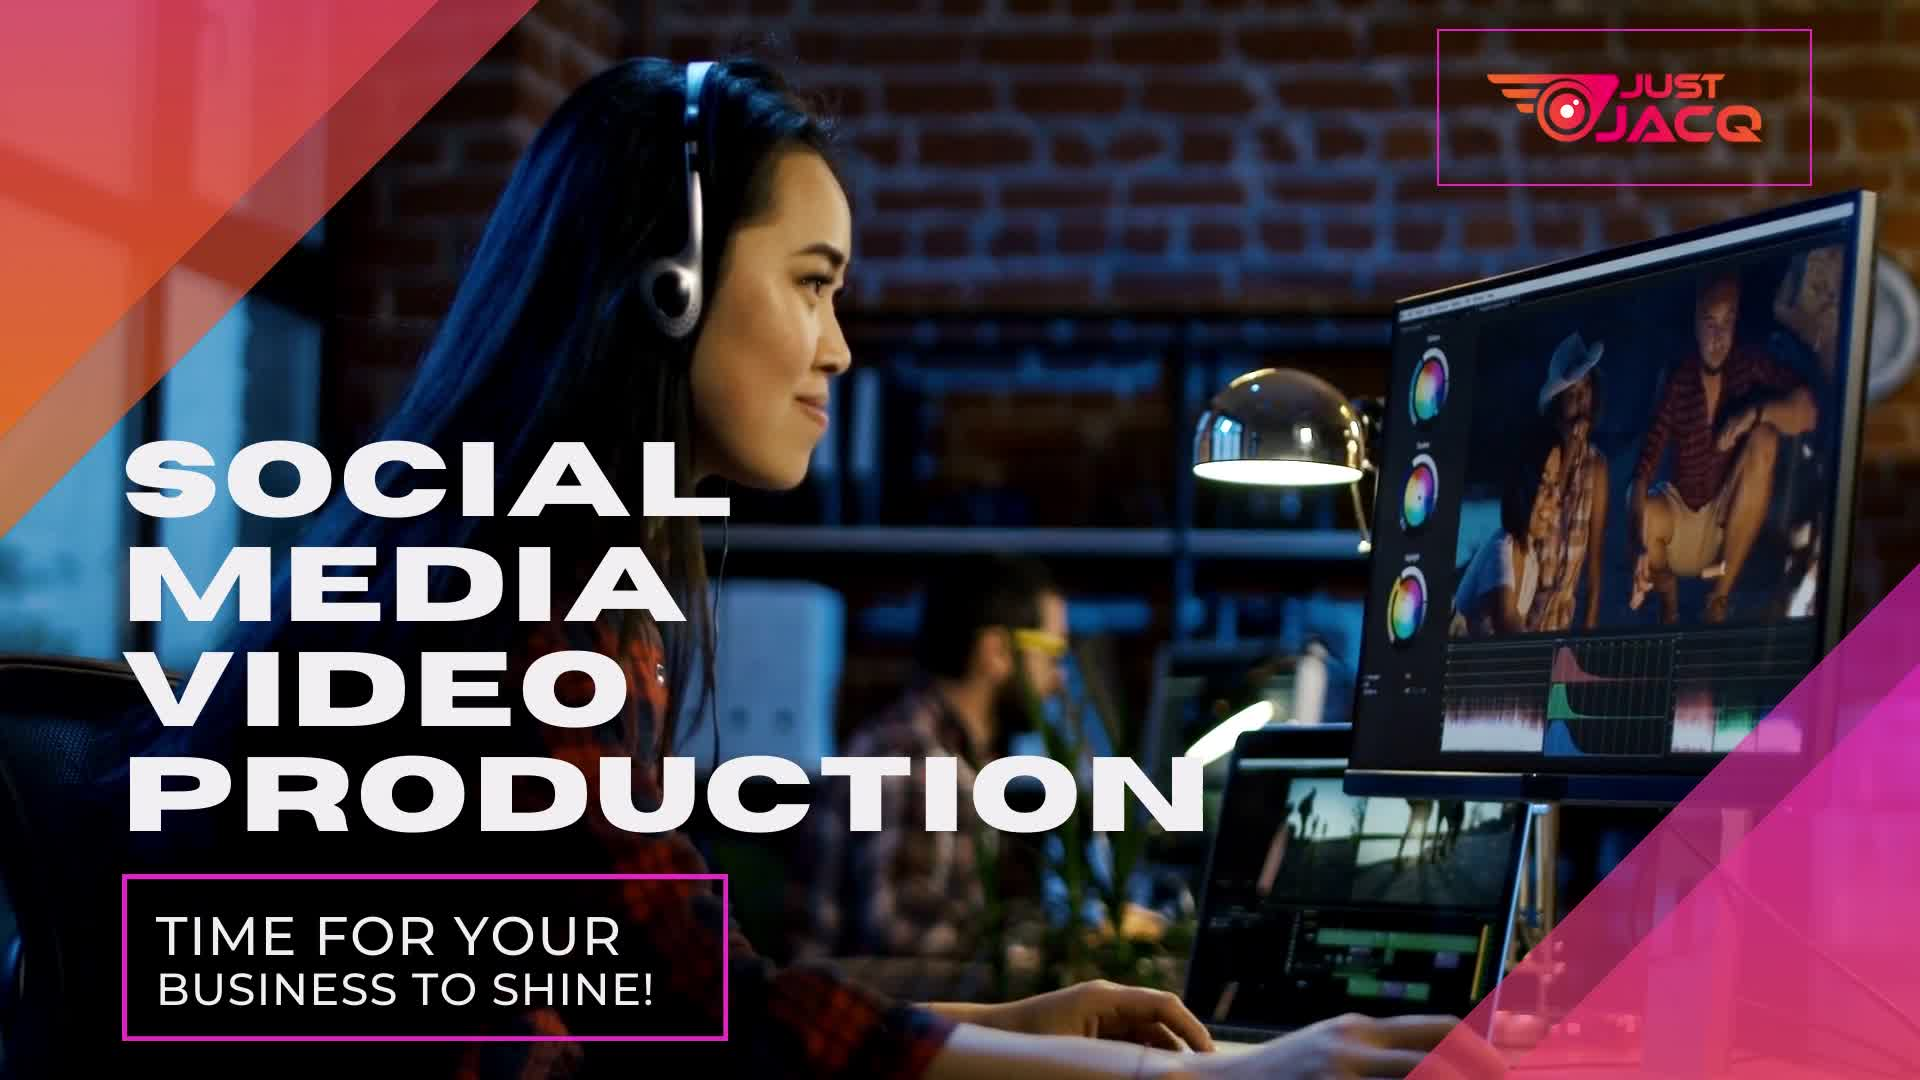 professional-video-animation-freelancer-image-263956